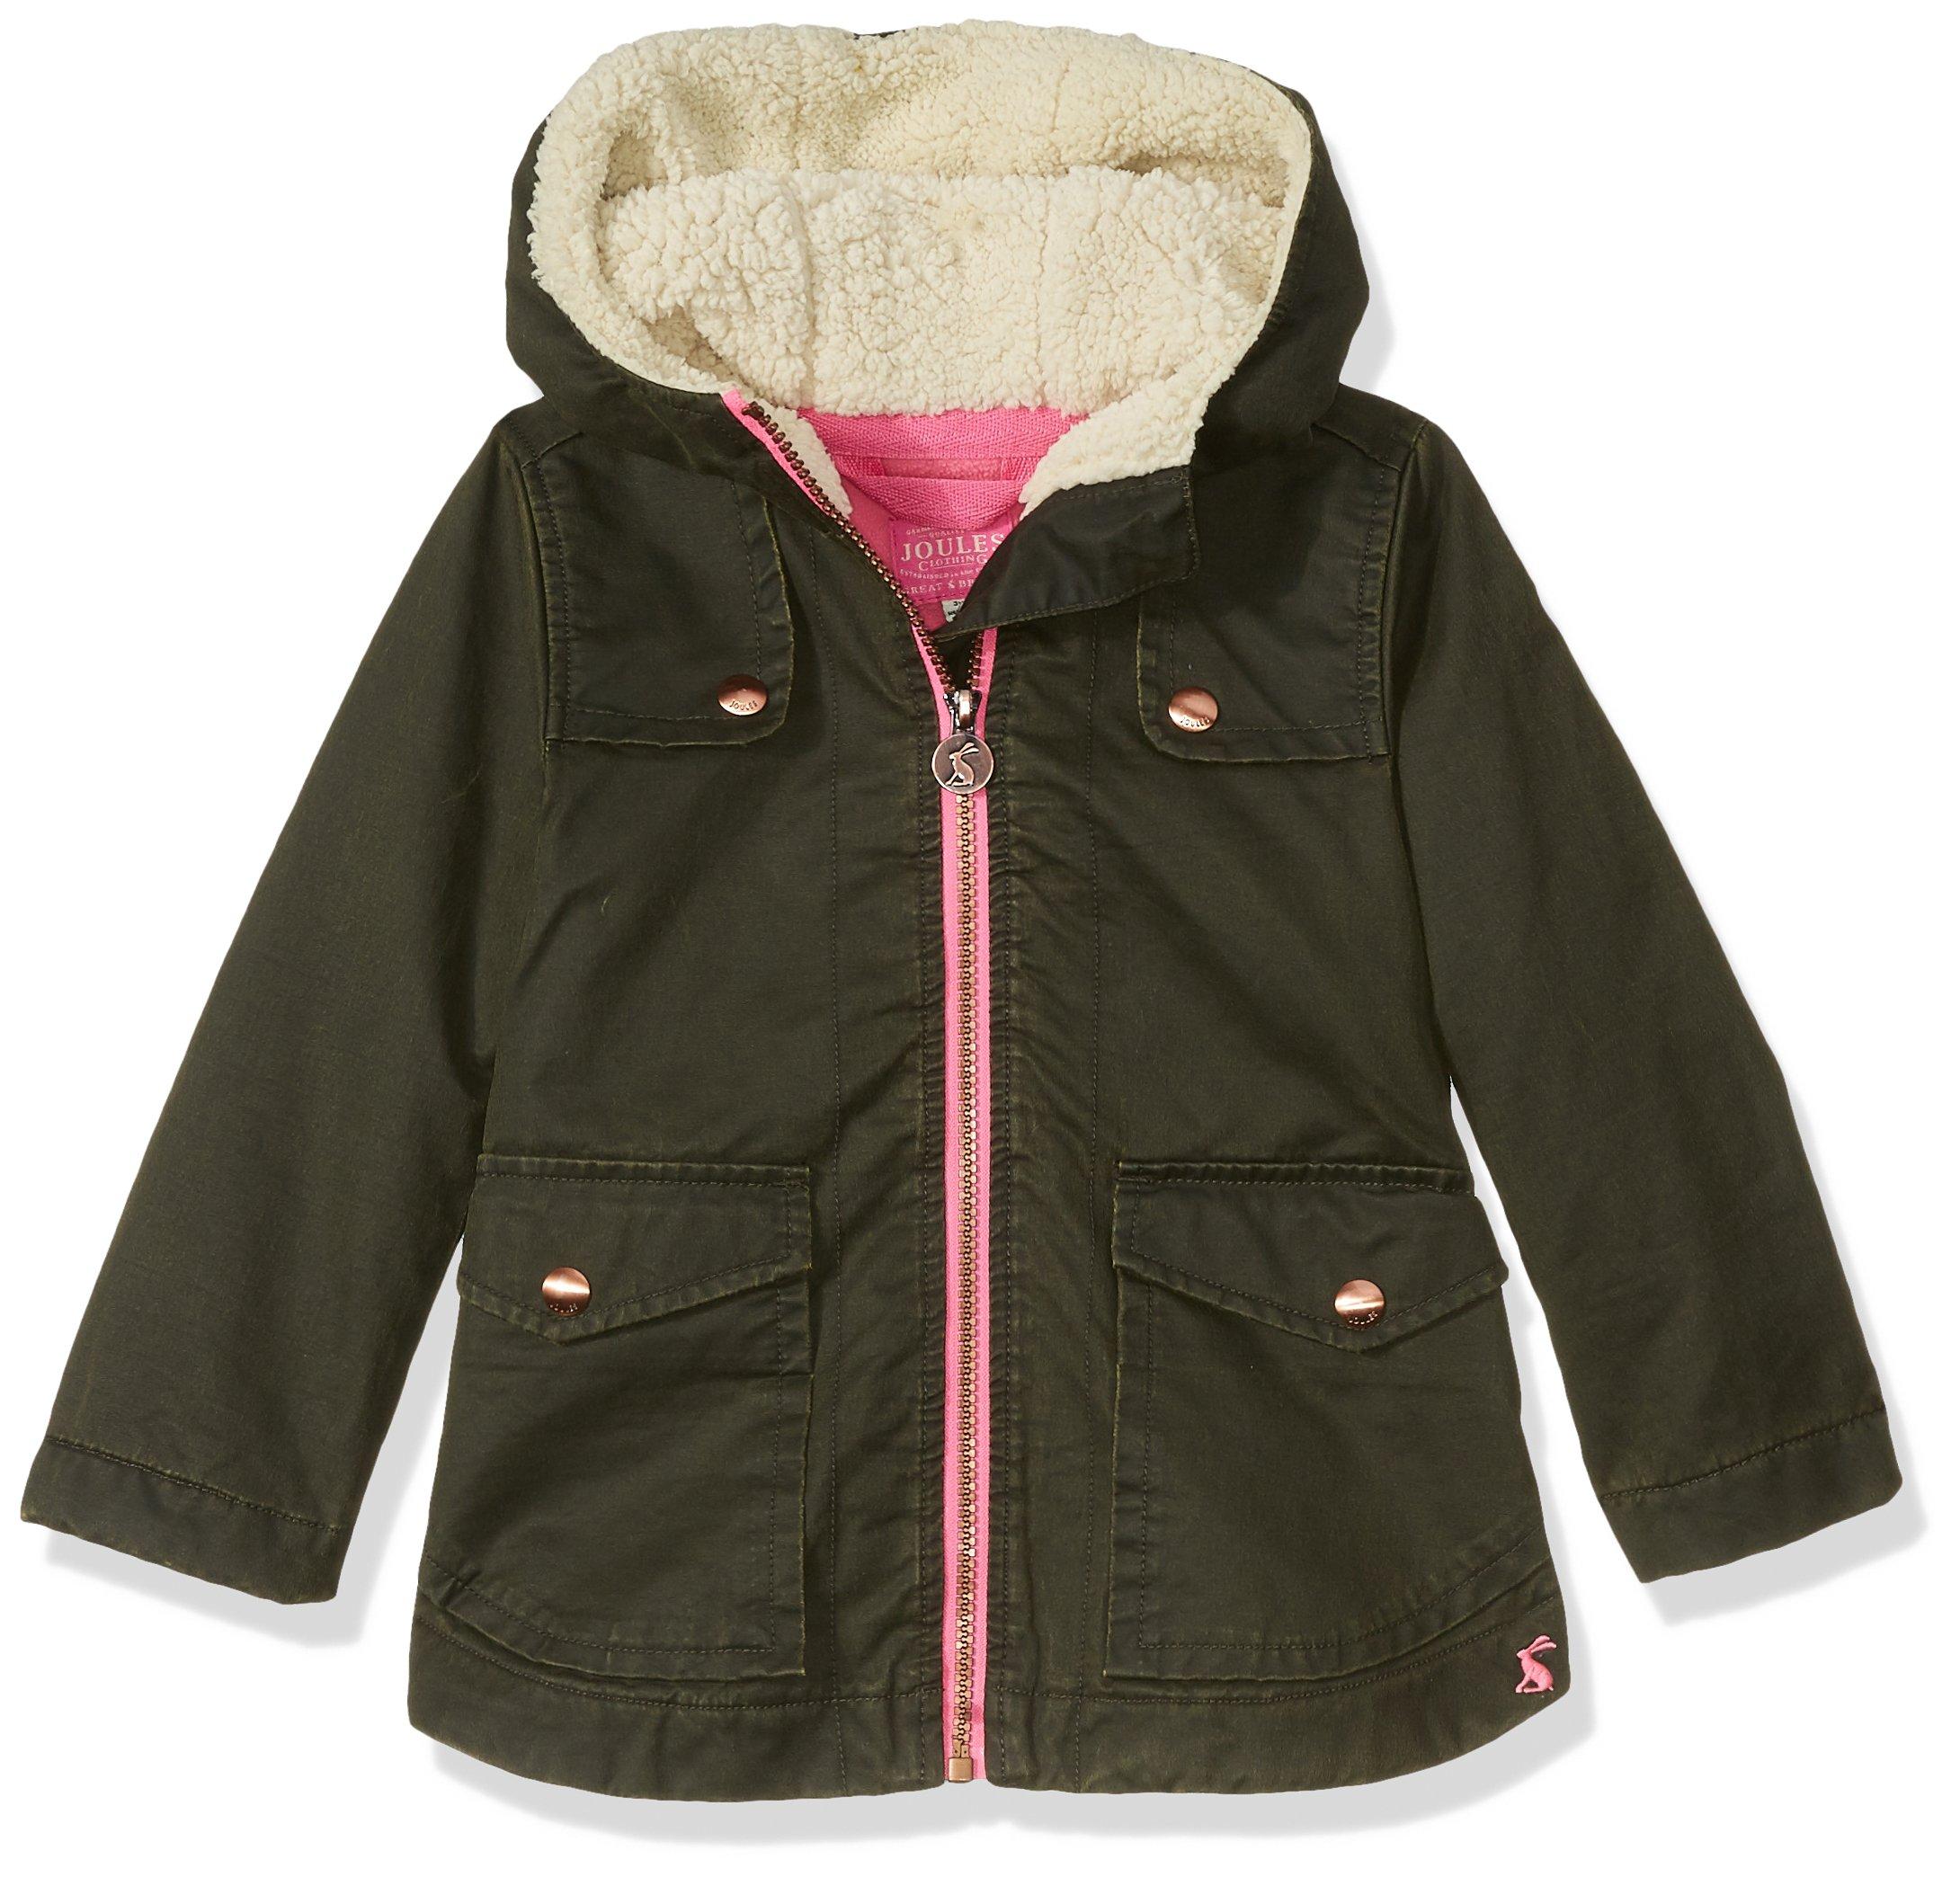 Joules Little Girls' Clover Parka Coat, Everglade, 5